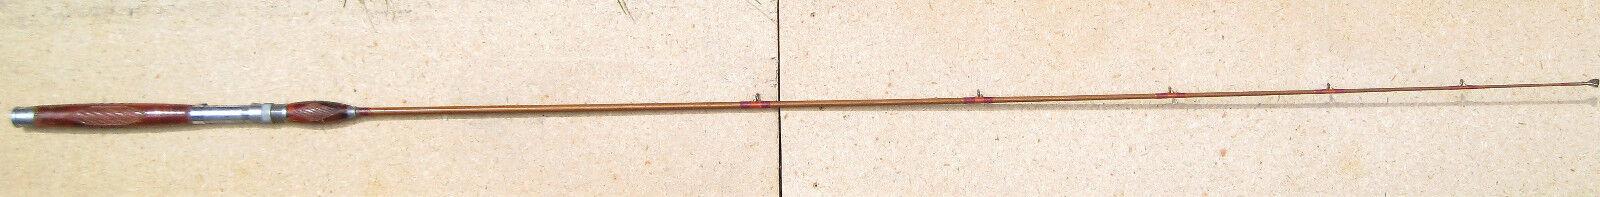 Antique Heddon PAL OFFICIAL Convention 6' 6 Rod CARVED WOOD Handle Decor Display